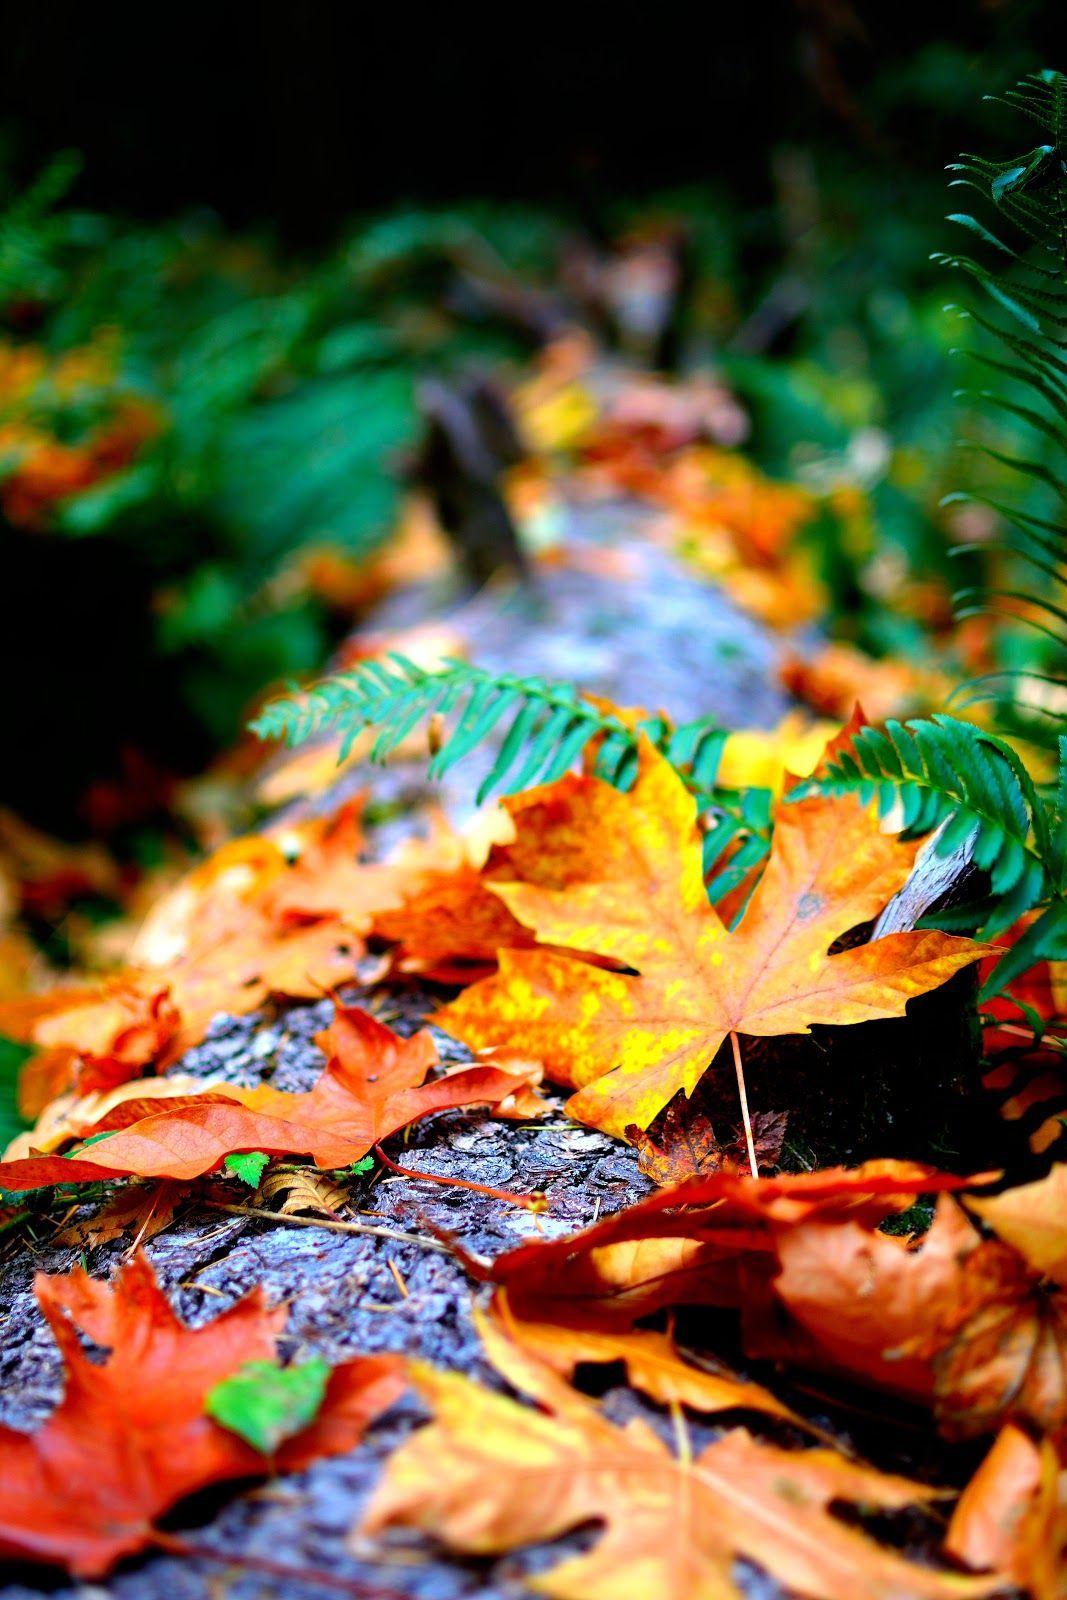 Autumn Wallpaper Blur Mywallpapers Site Hd Wallpaper Android Android Wallpaper 4k Wallpaper For Mobile